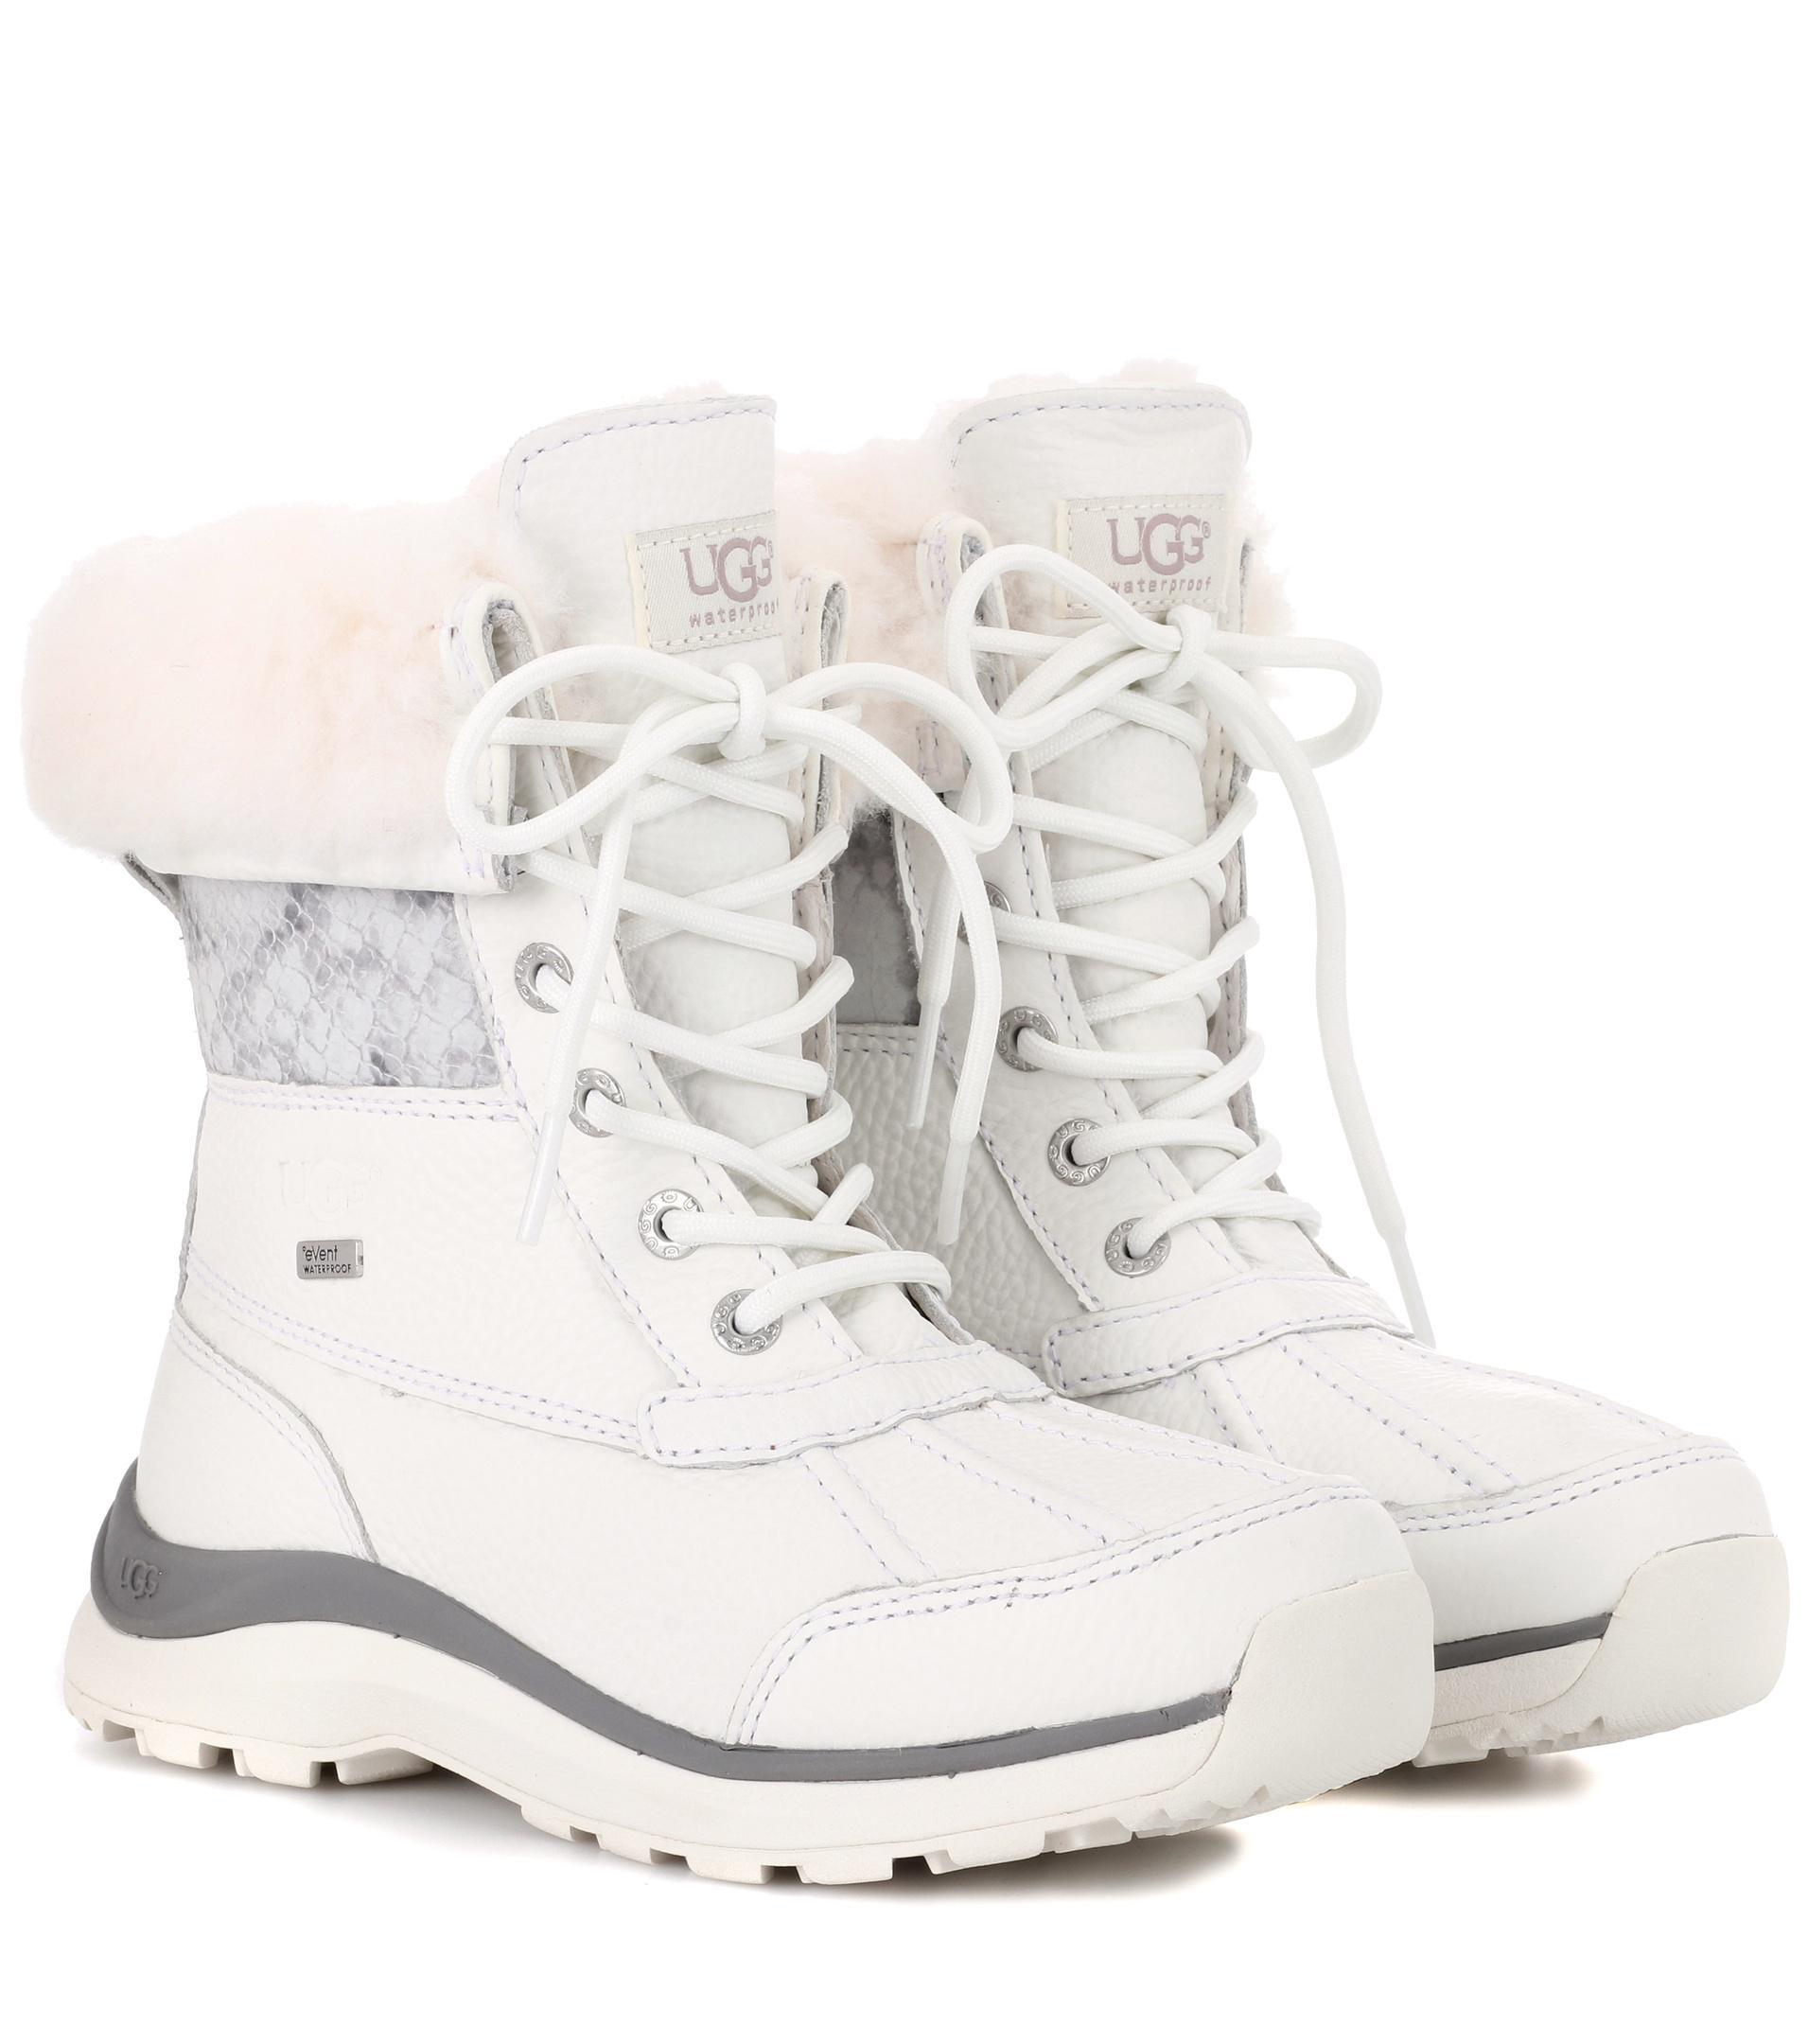 a8def96ae8e Ugg White Adirondack Iii Leather Boots